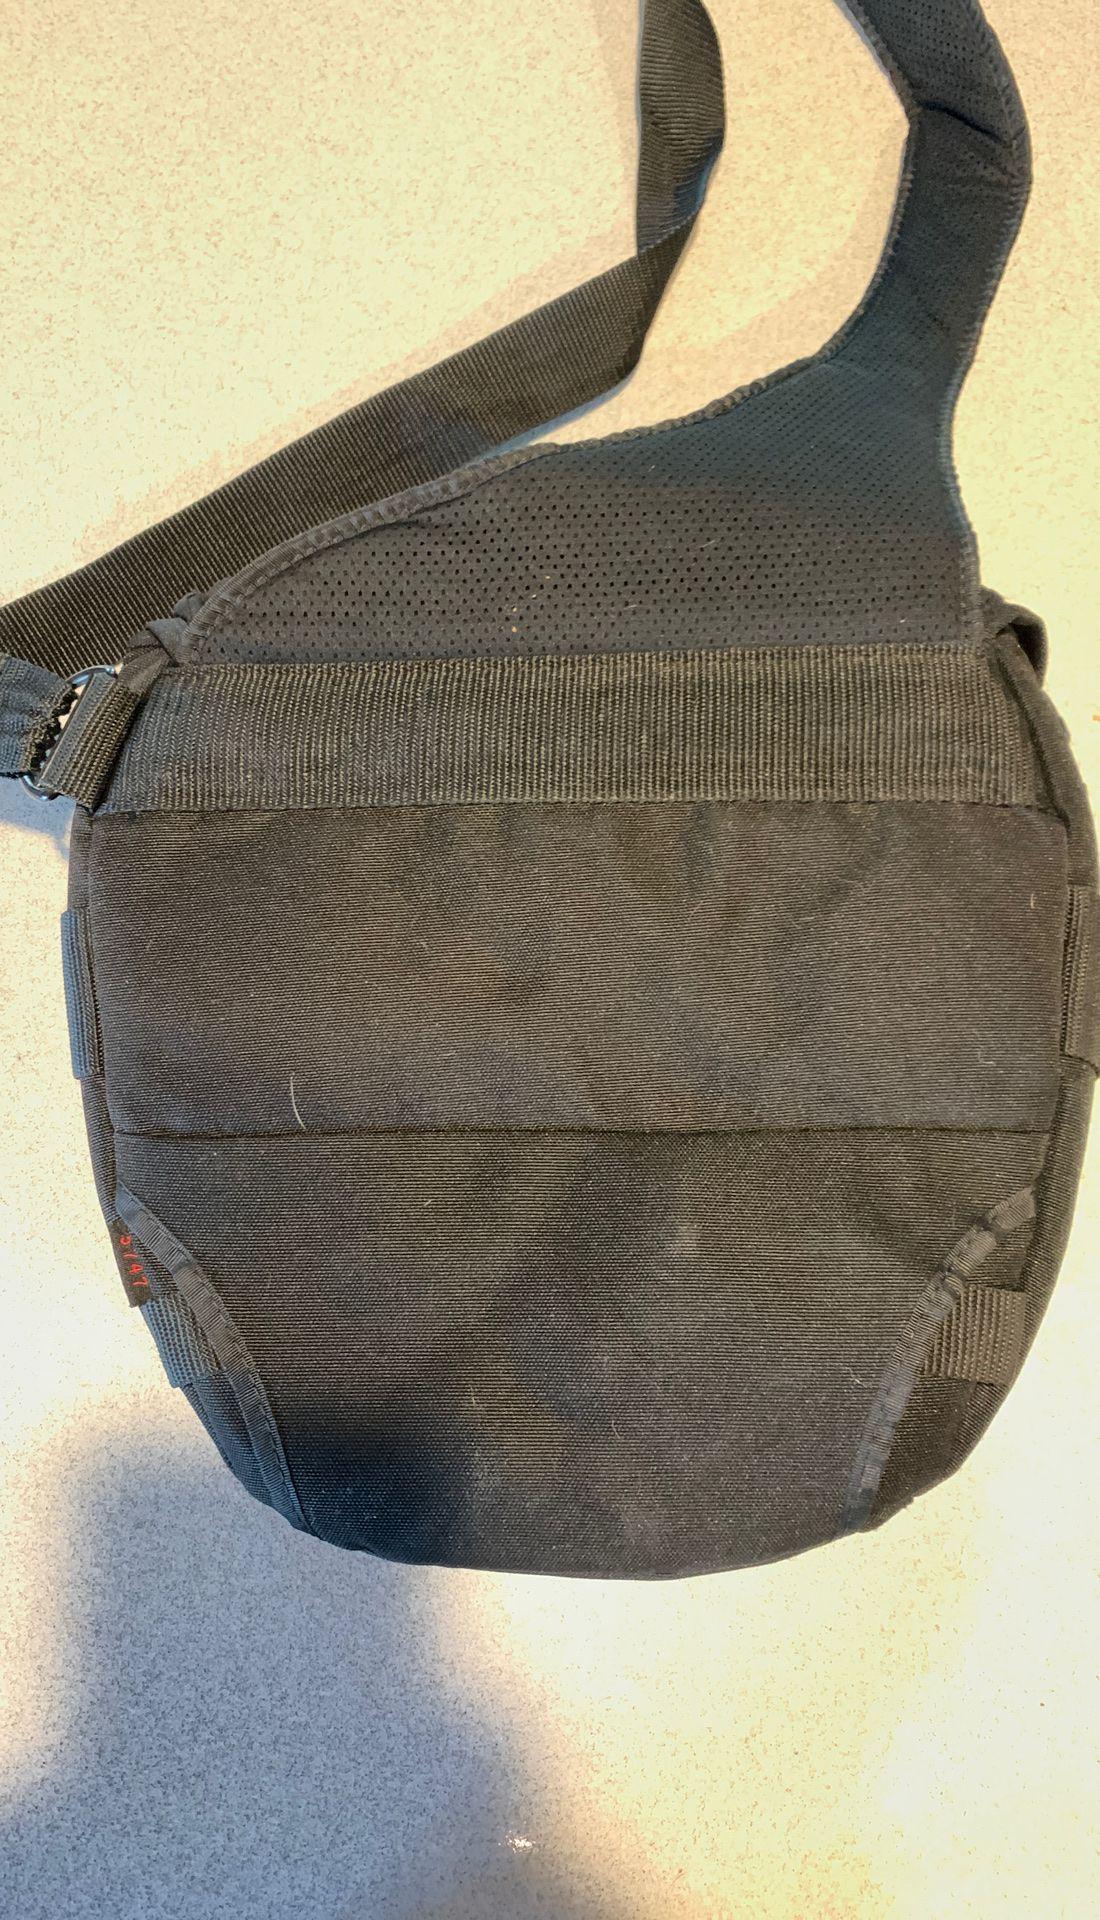 Tarmac DSLR camera Pouch. Velocity 7 shoulder bag.